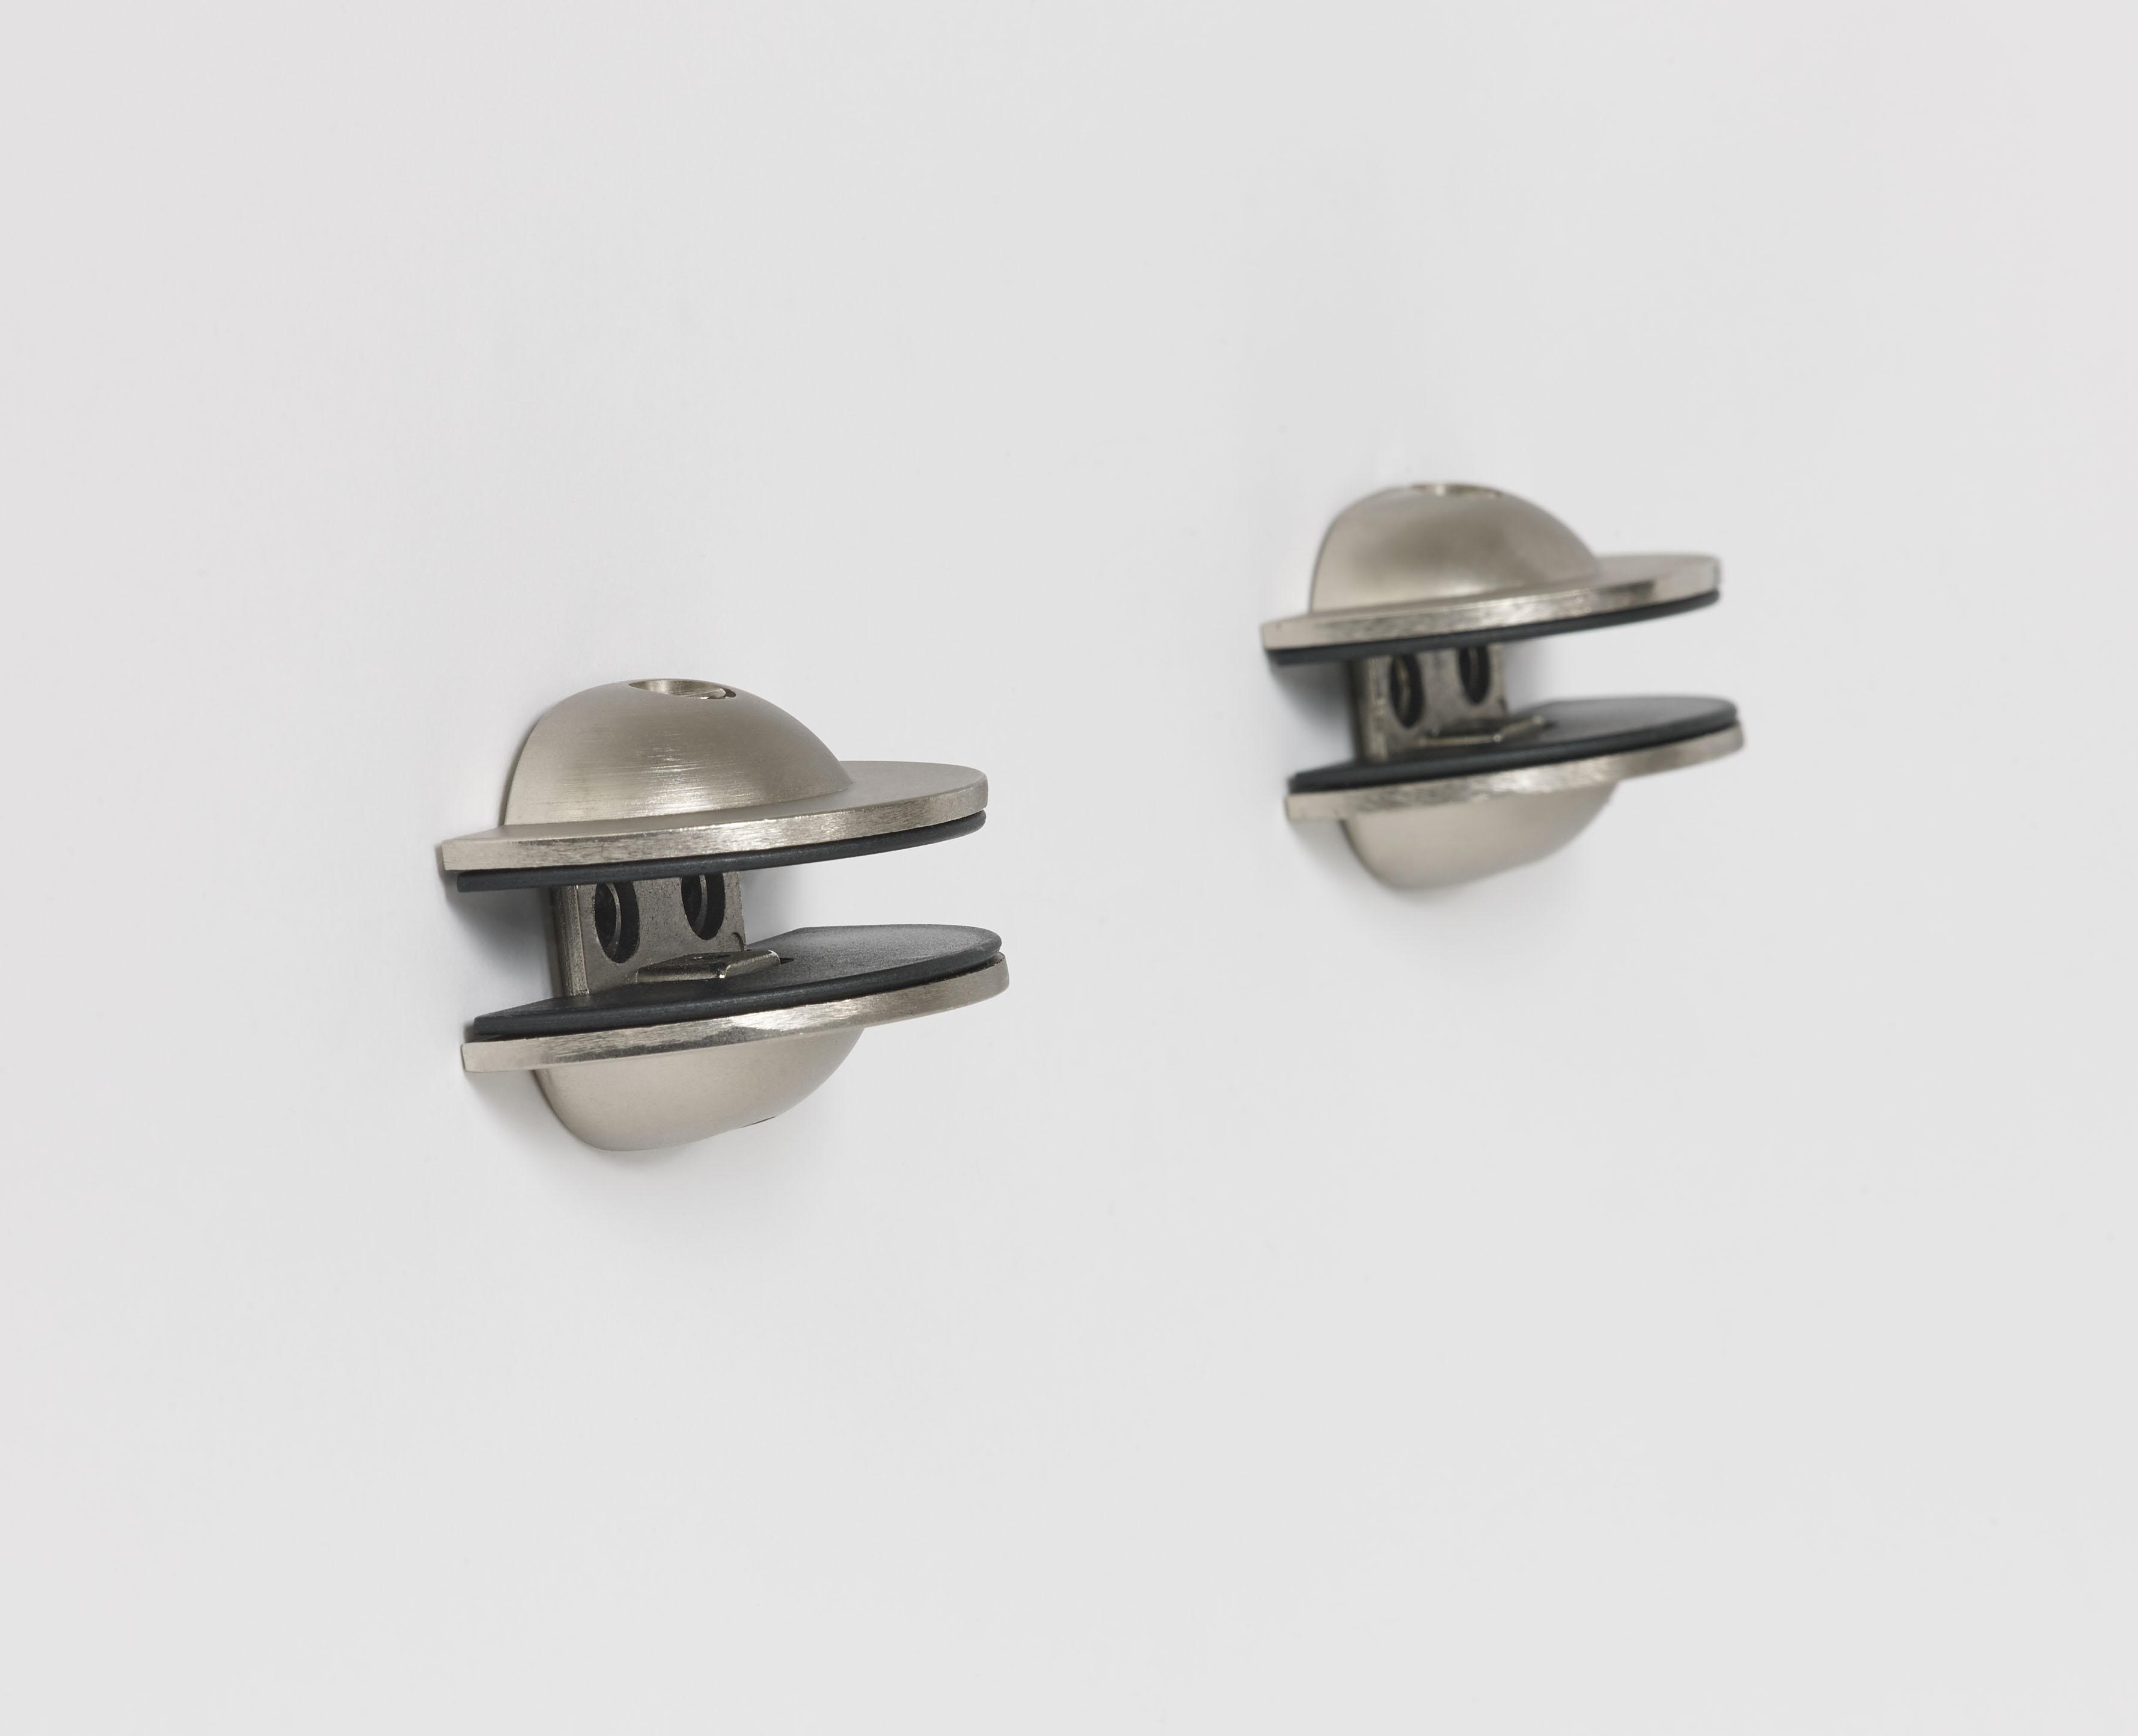 Titanium Saucer Bracket Pair Mounted Shelf Support